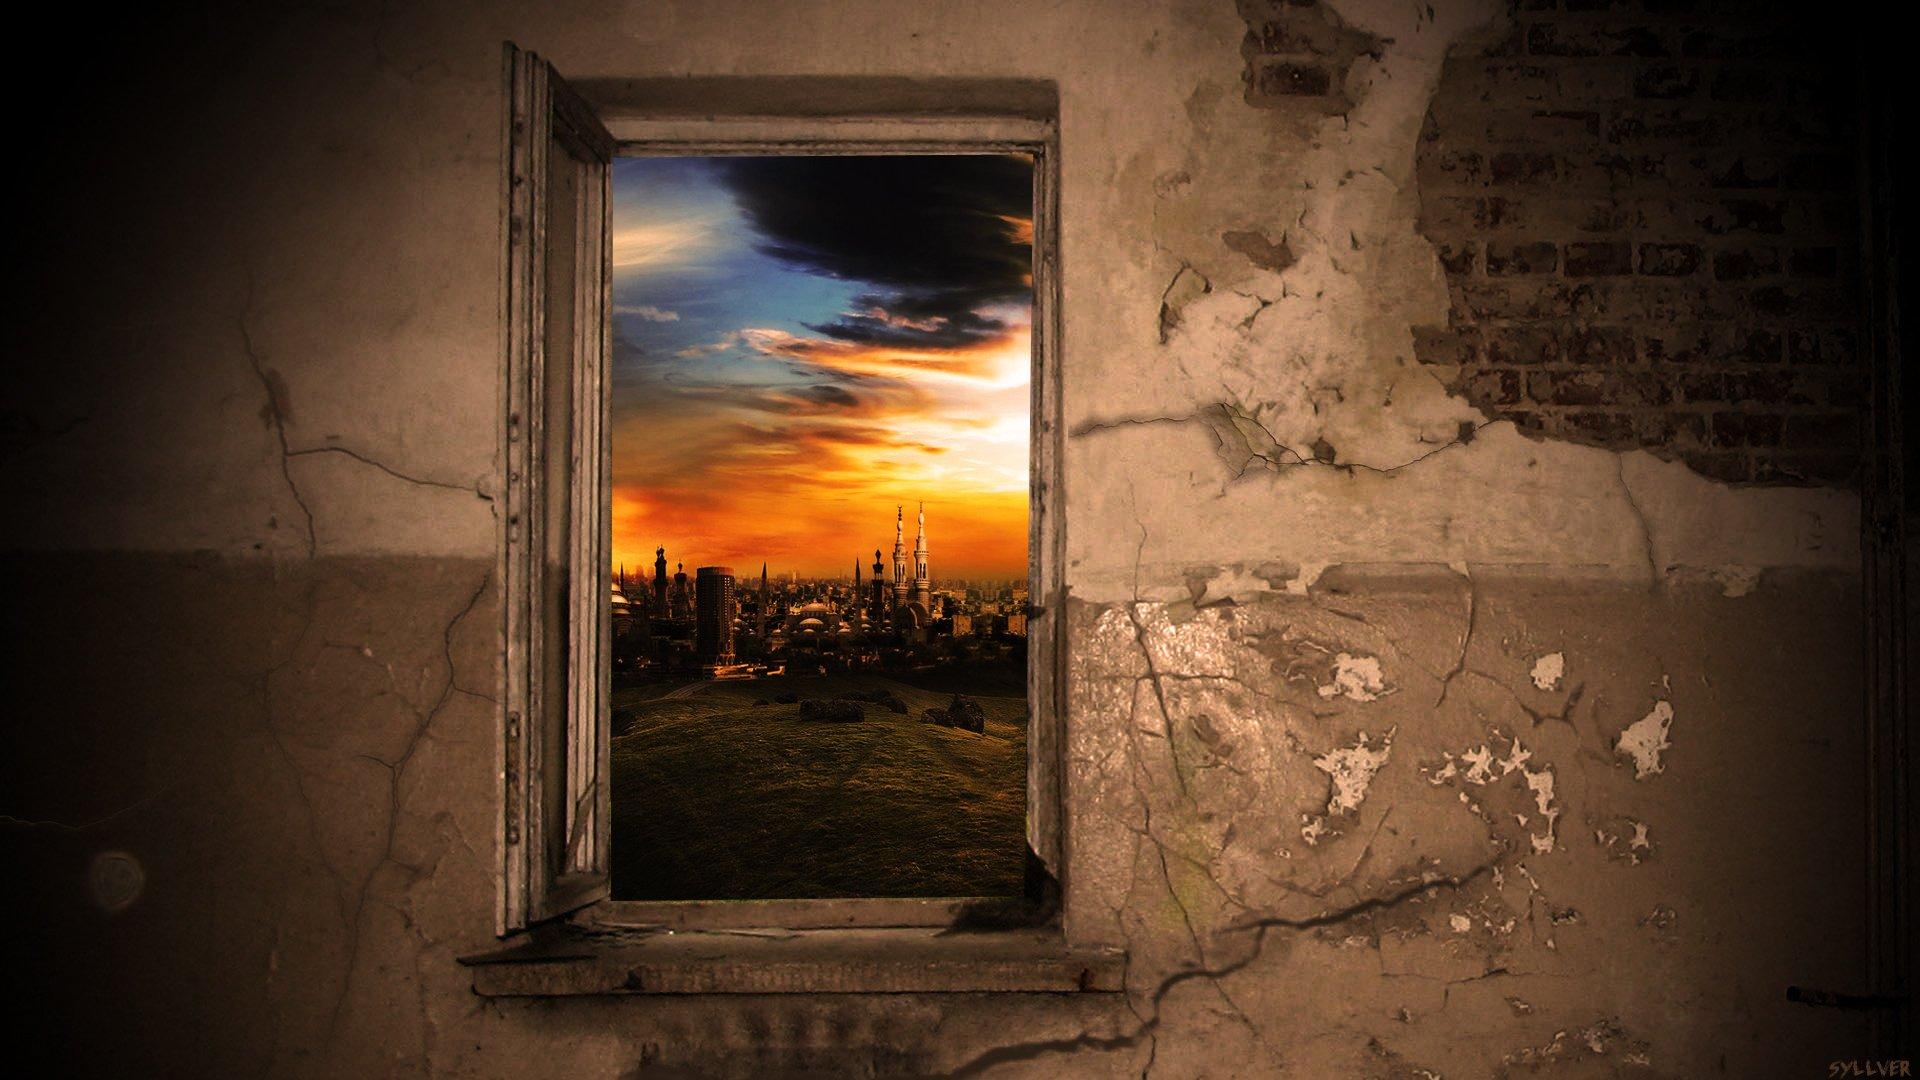 Wall windows bricks city hd обои для ноутбука.